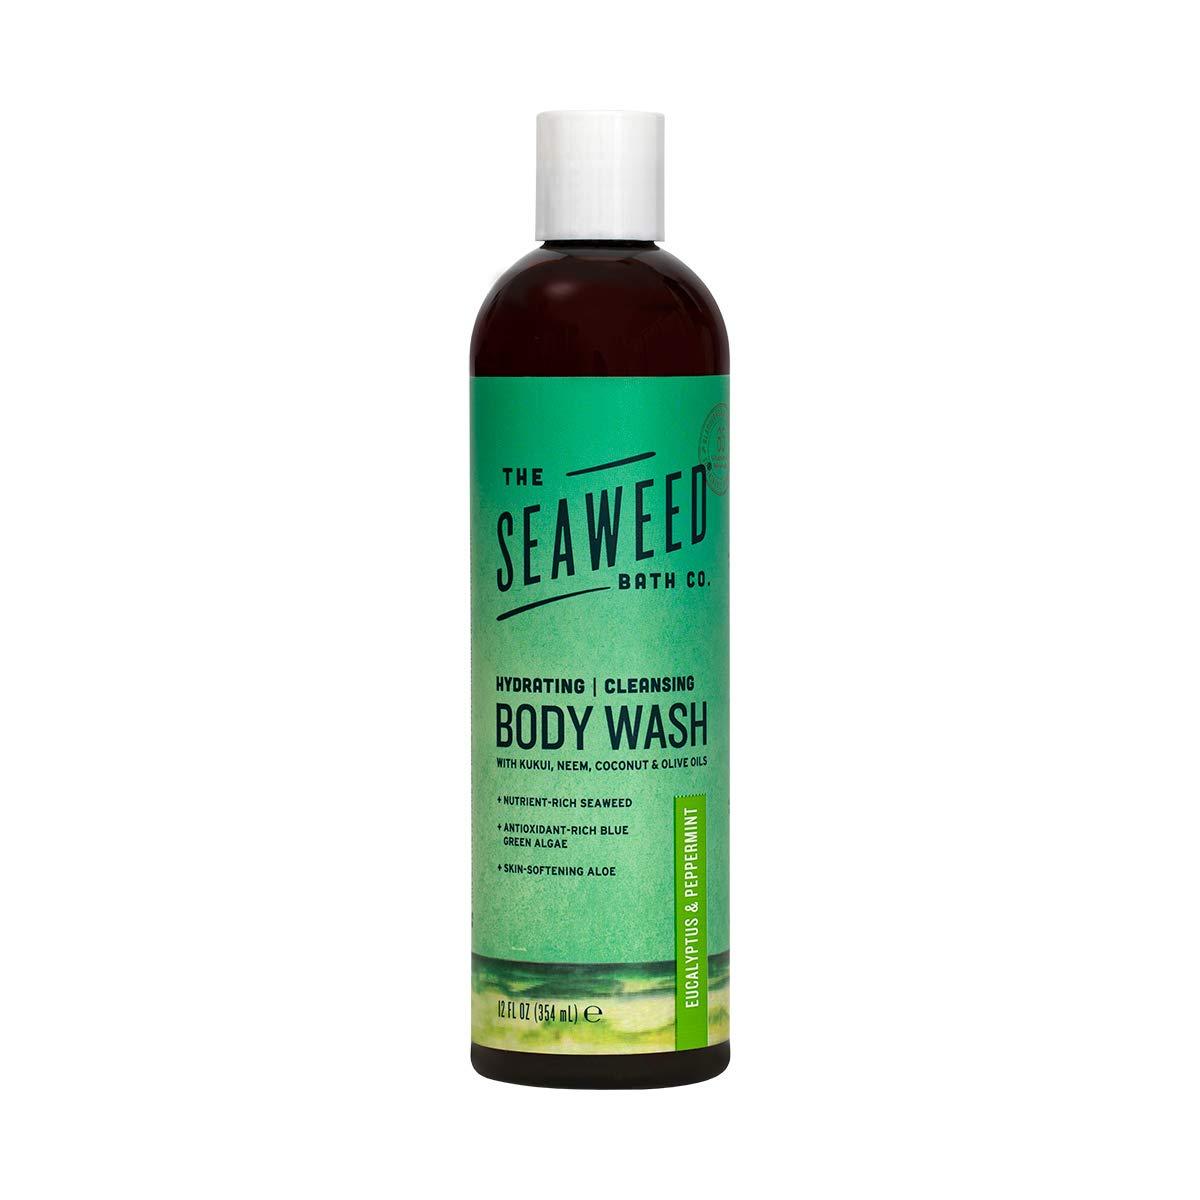 The Seaweed Bath Co. Body Wash, Eucalyptus and Peppermint, Natural Organic Bladderwrack Seaweed, SLS and Paraben Free, 12oz by The Seaweed Bath Co.